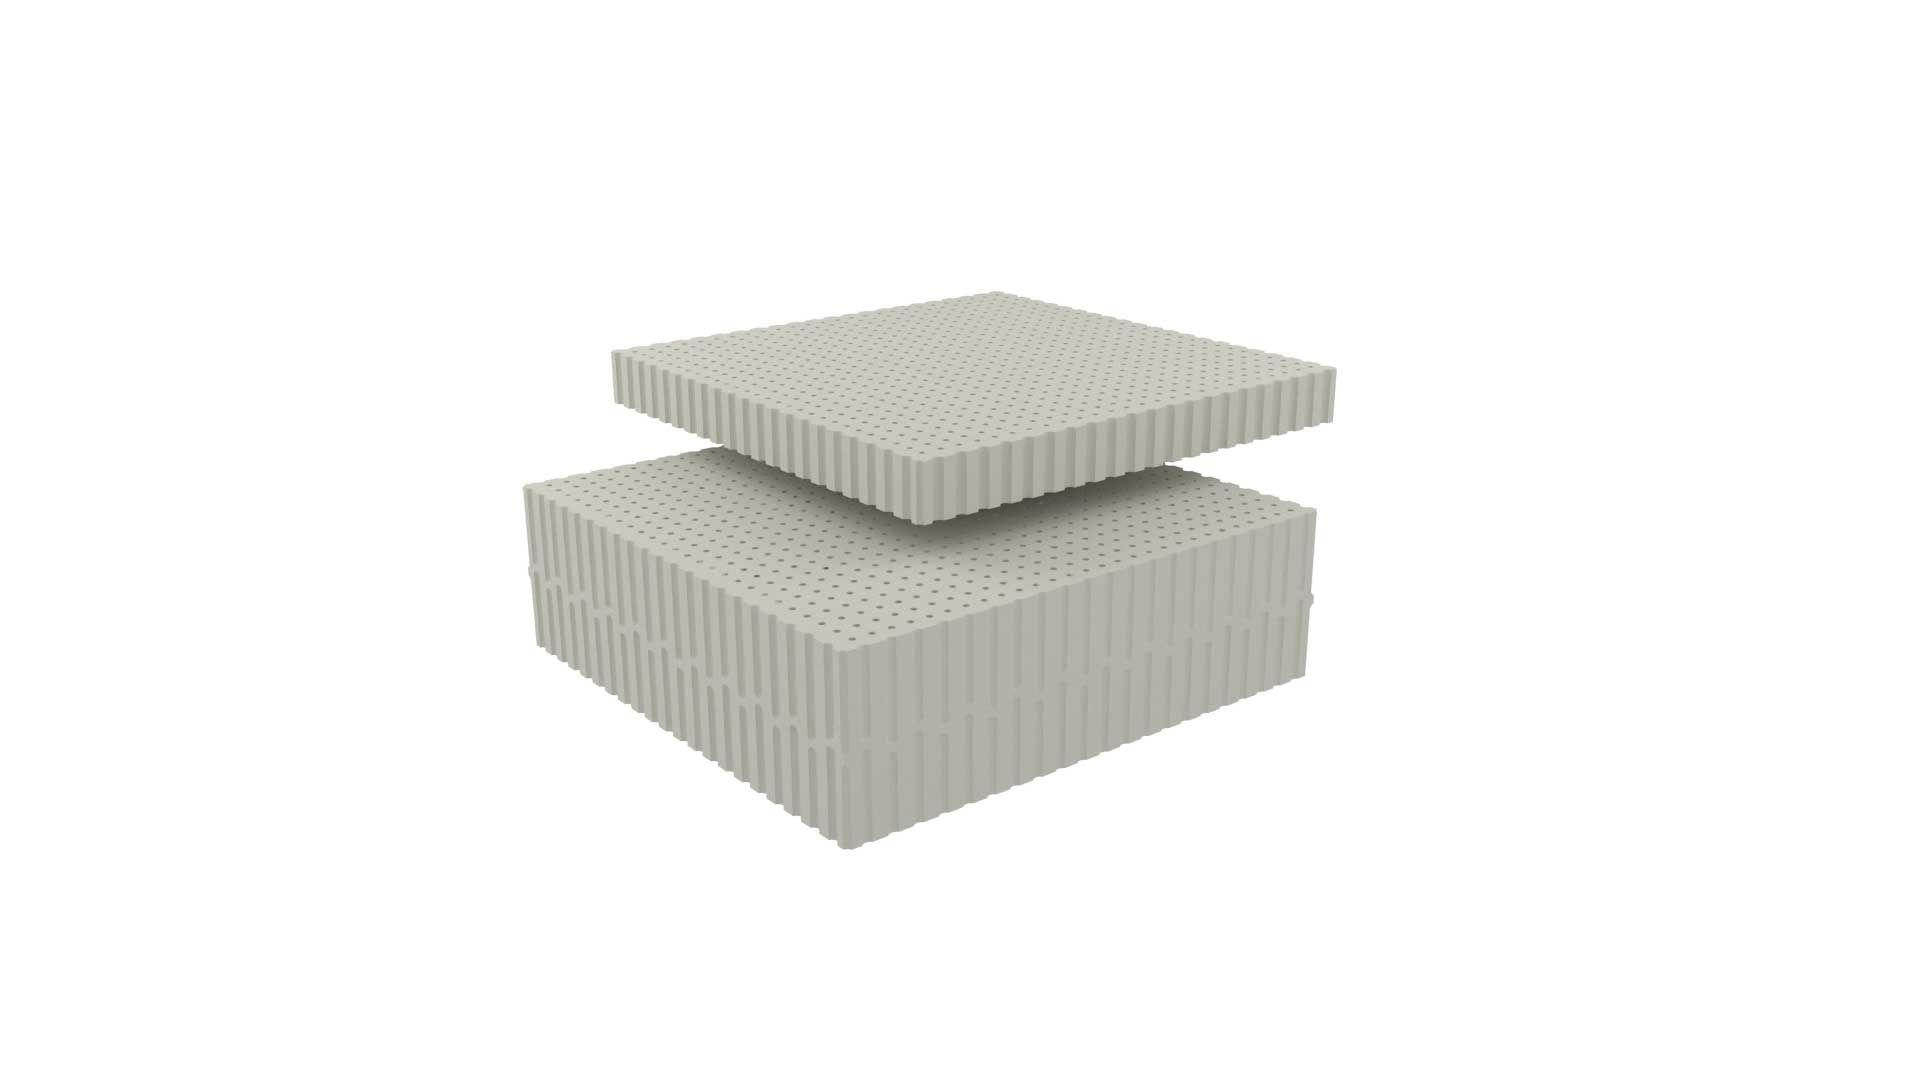 Dunlopillo Στρώμα Belvista, ανατομικό στρώμα ύπνου, ύψους 21cm, μέτριο,από 100% φυσικό Τalalay Latex